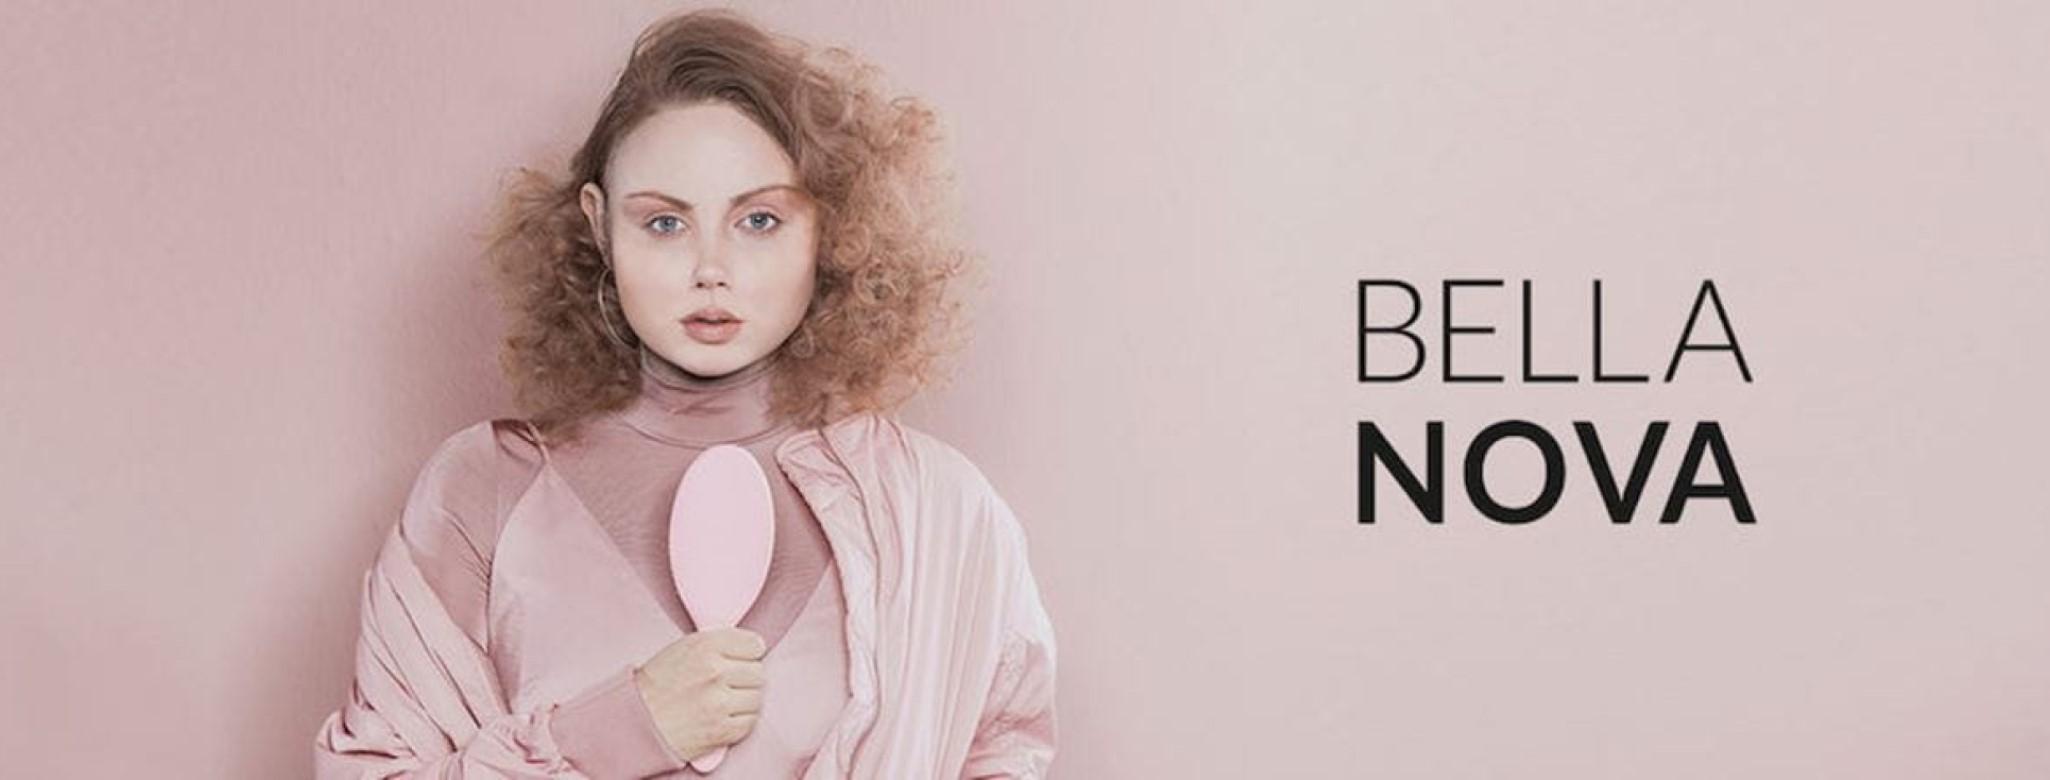 Bella Nova Brand banner